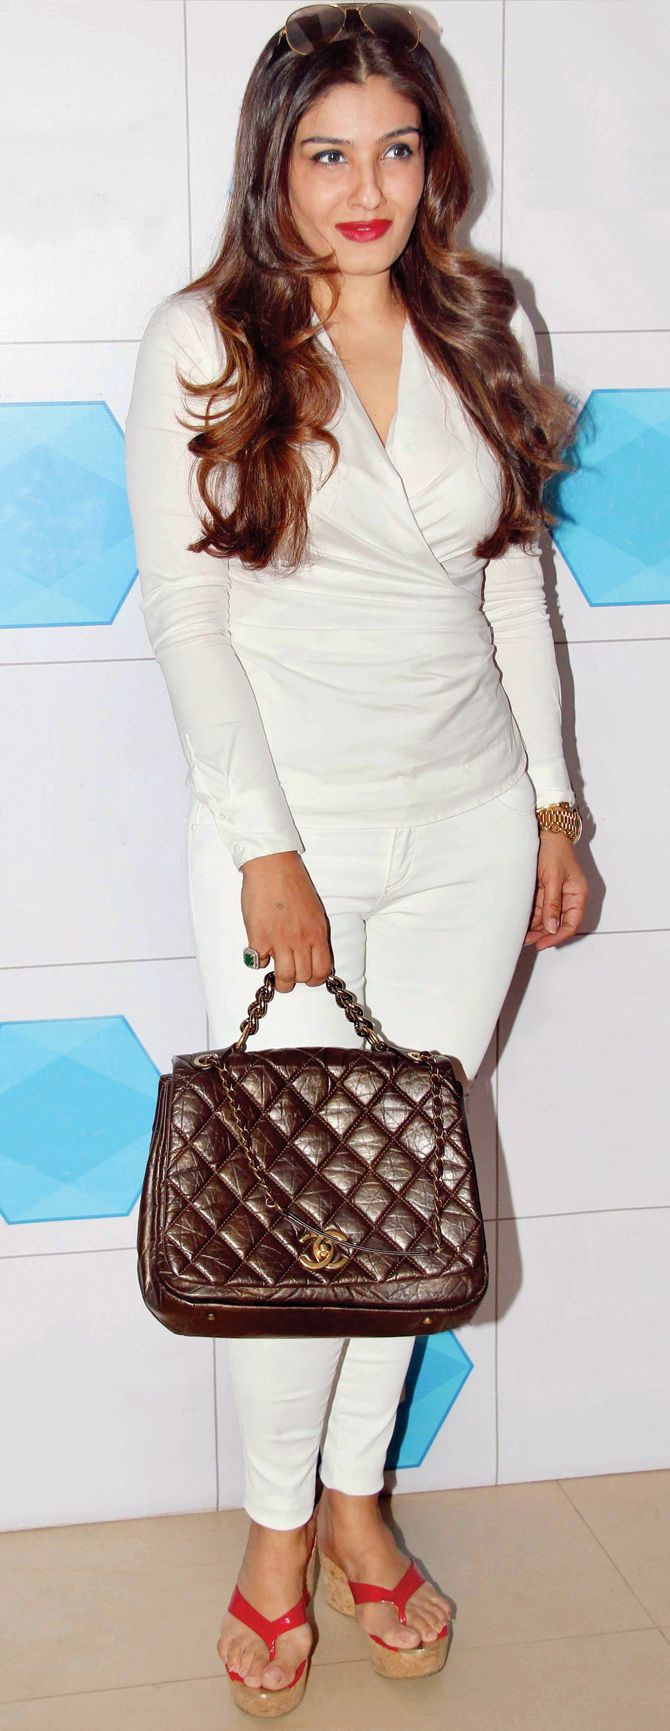 Raveena Tandon in an all-white ensemble at the inauguration of a sports hall at a Mumbai school. #Bollywood #Fashion #Style #Beauty #Hot #Sexy